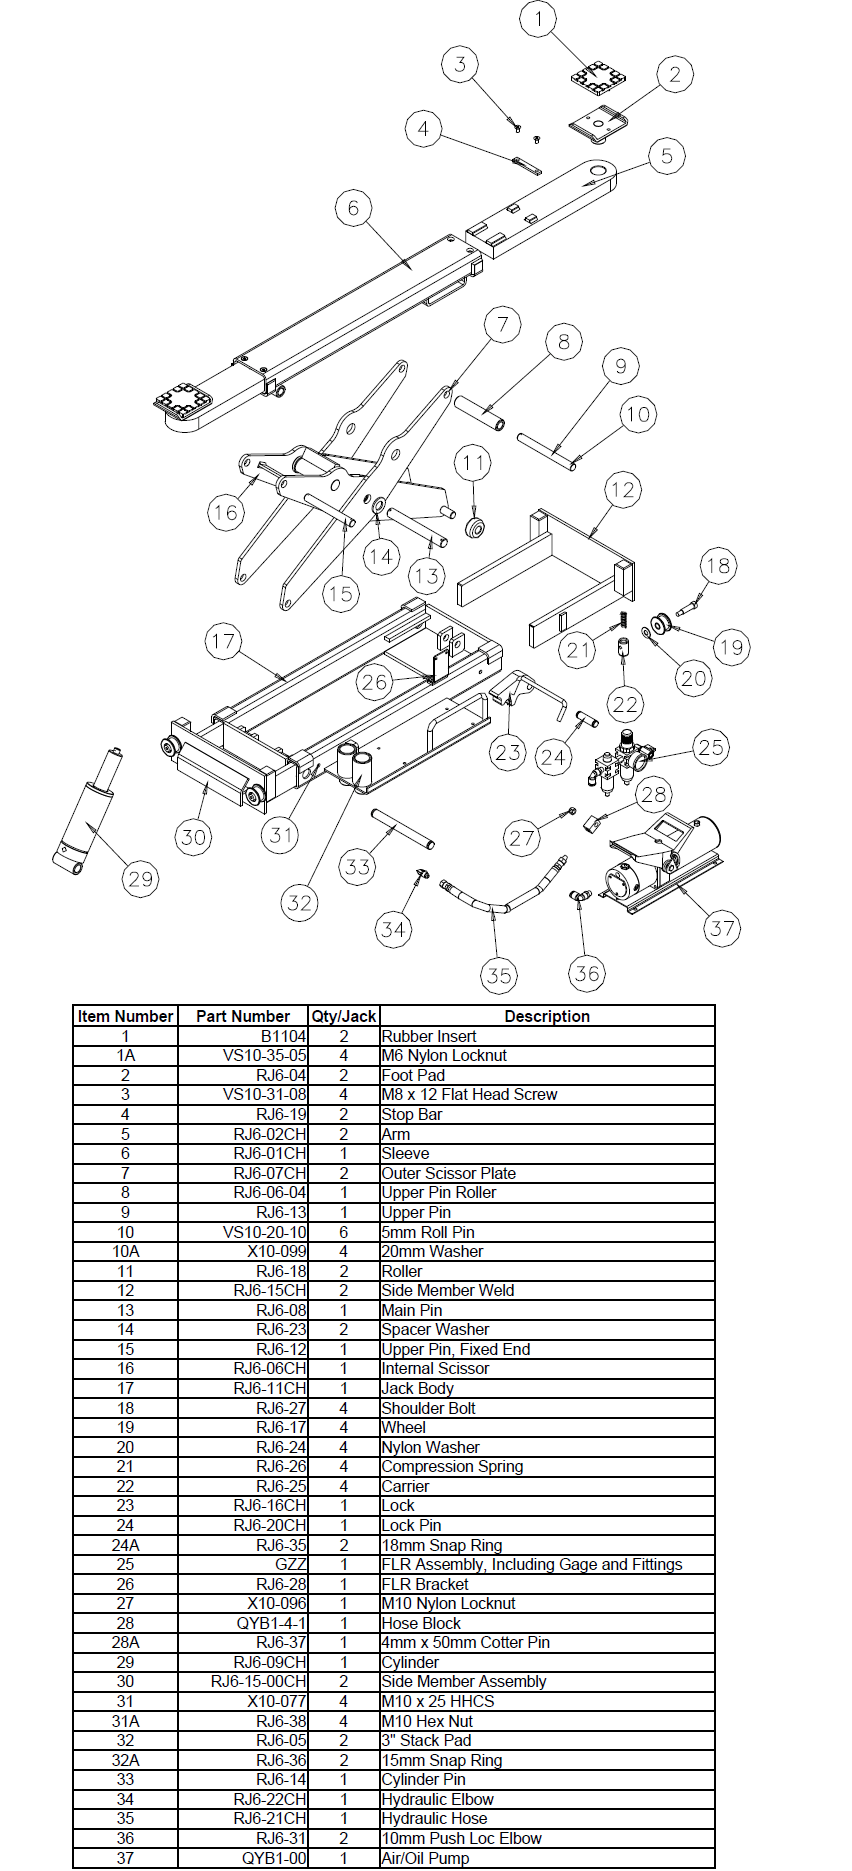 Parts Diagram for Challenger RJ6